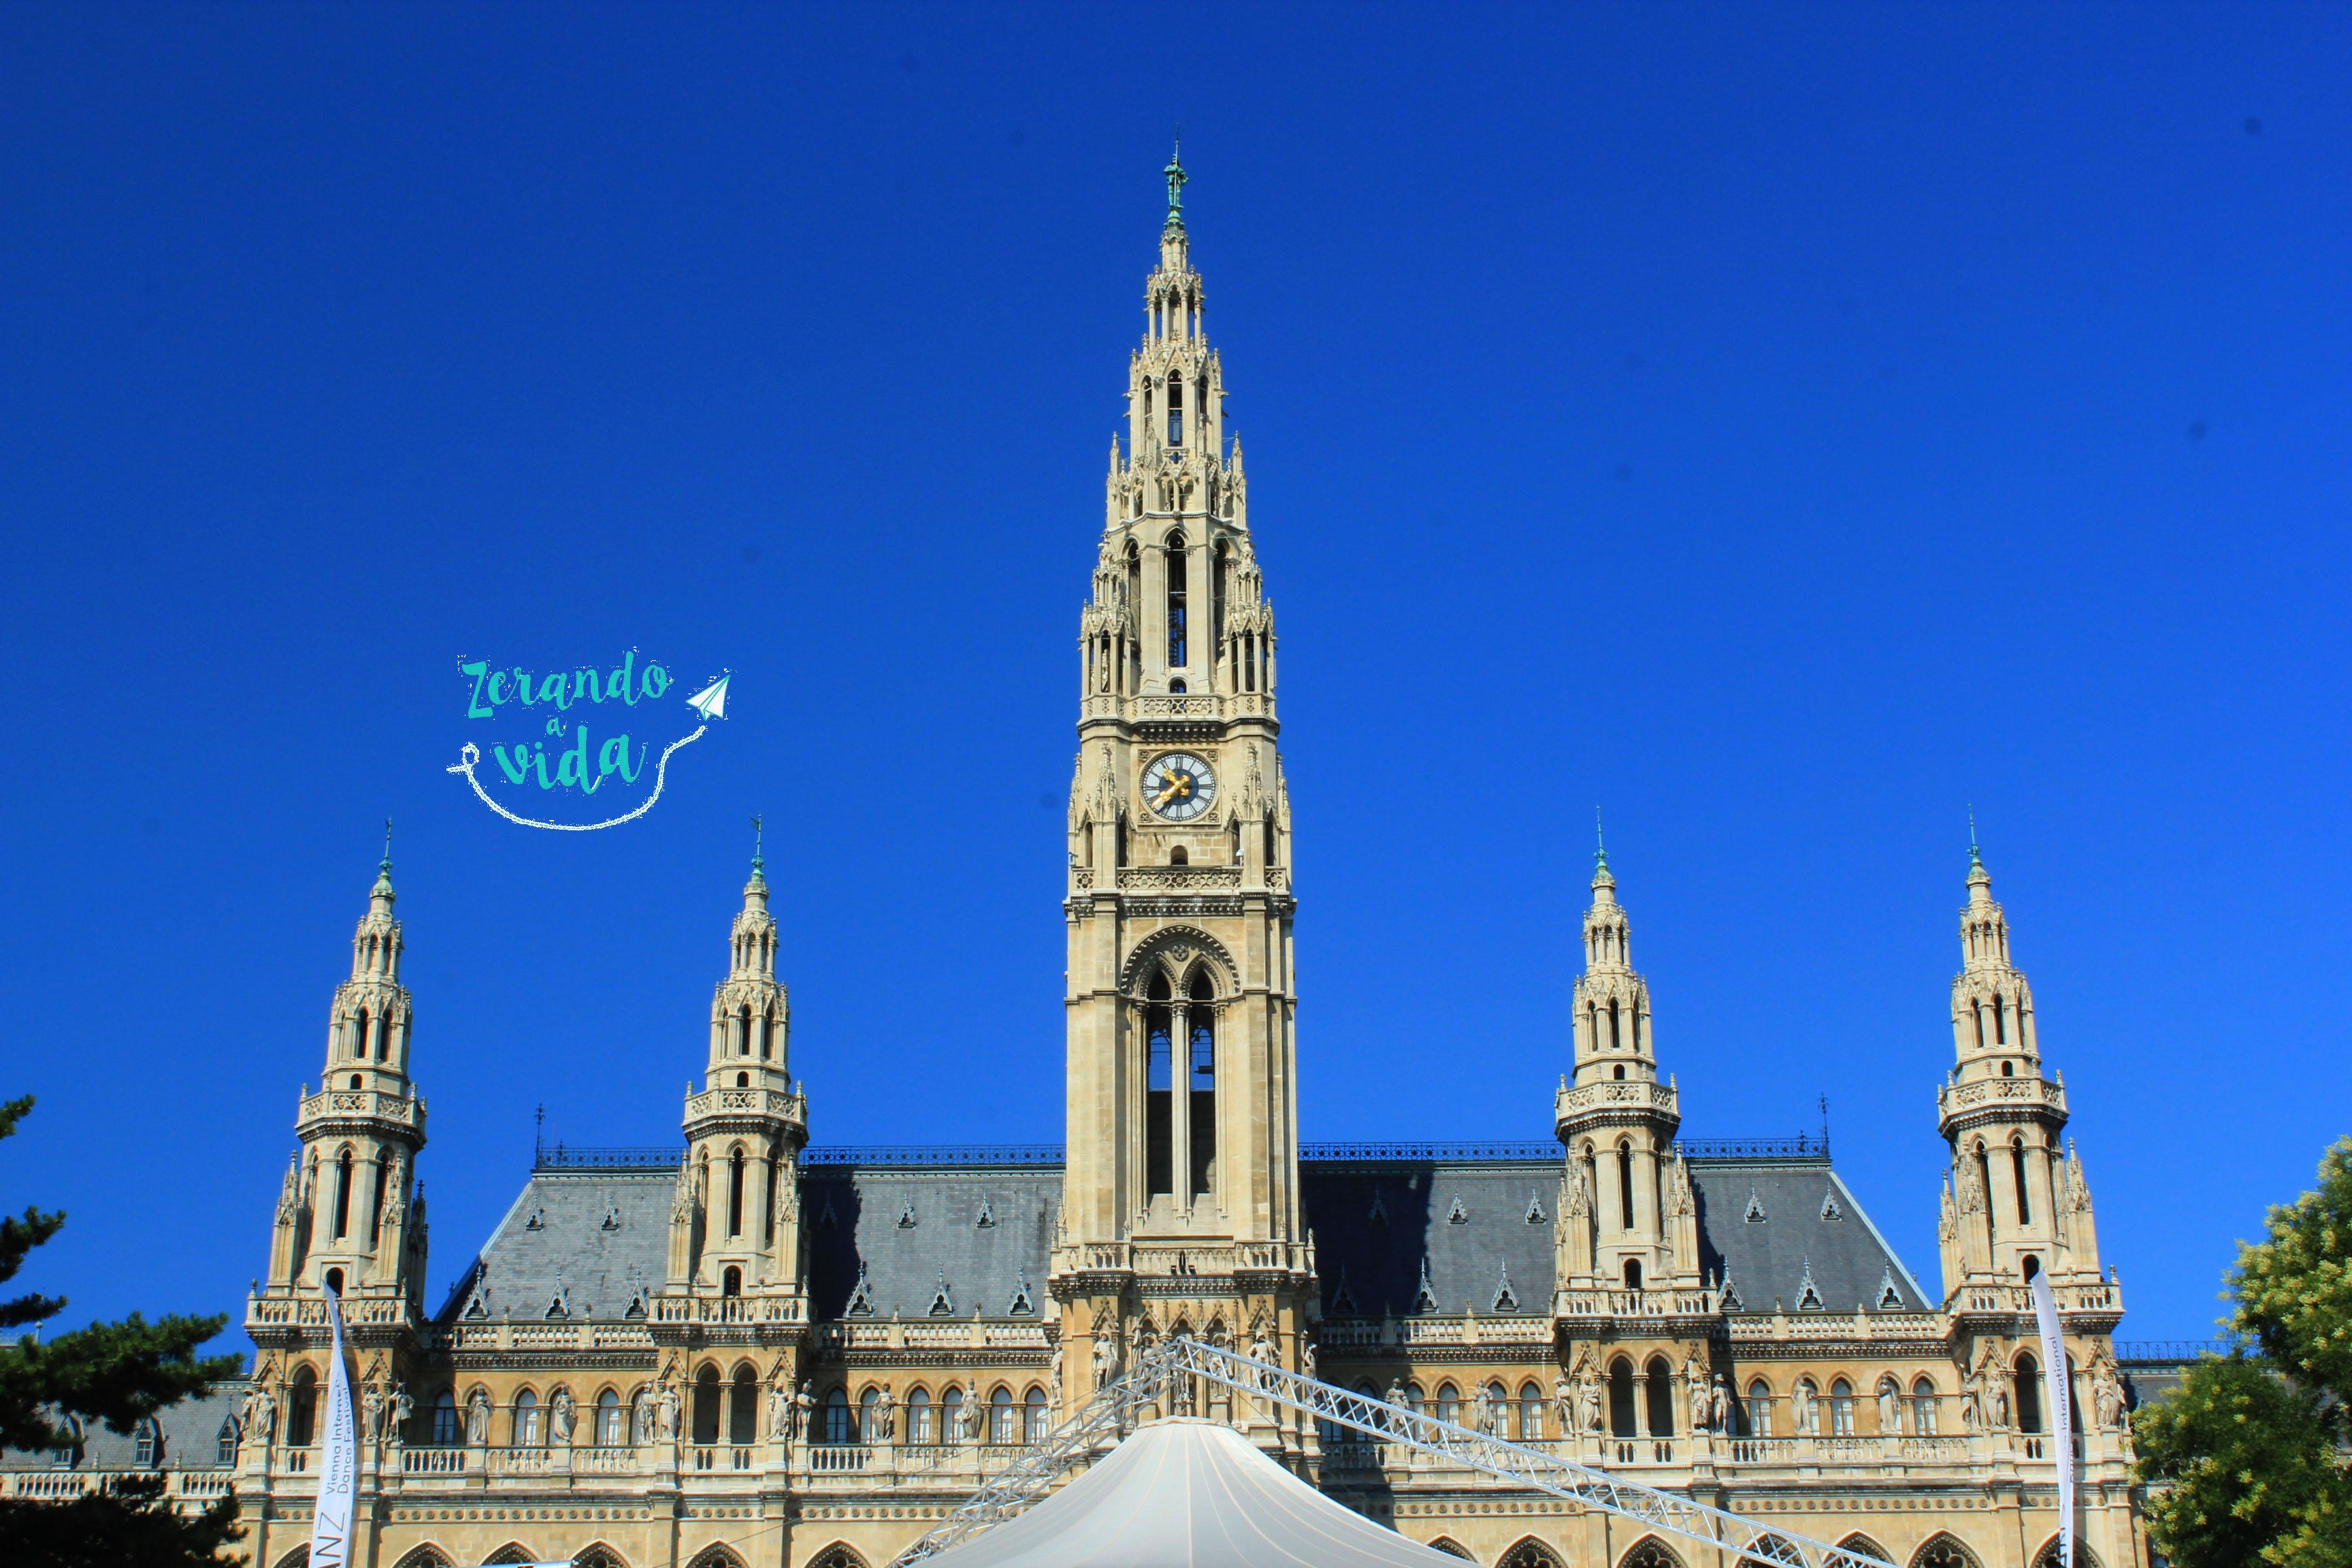 Rathaus, City Hall